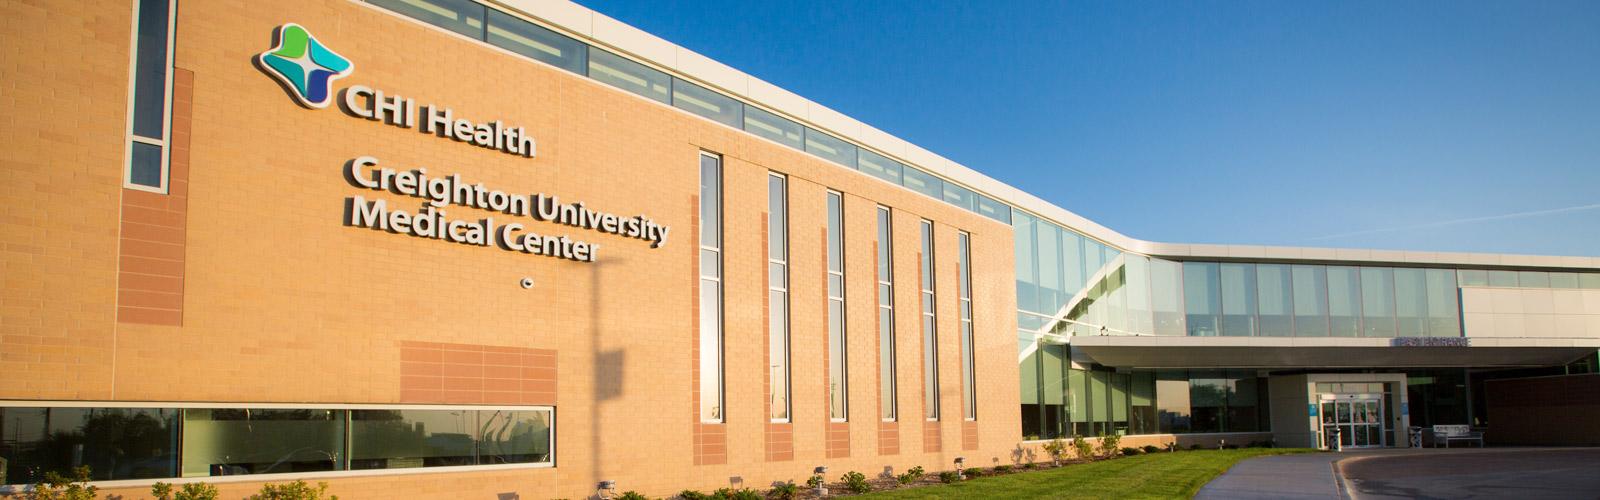 CHI health creighton university